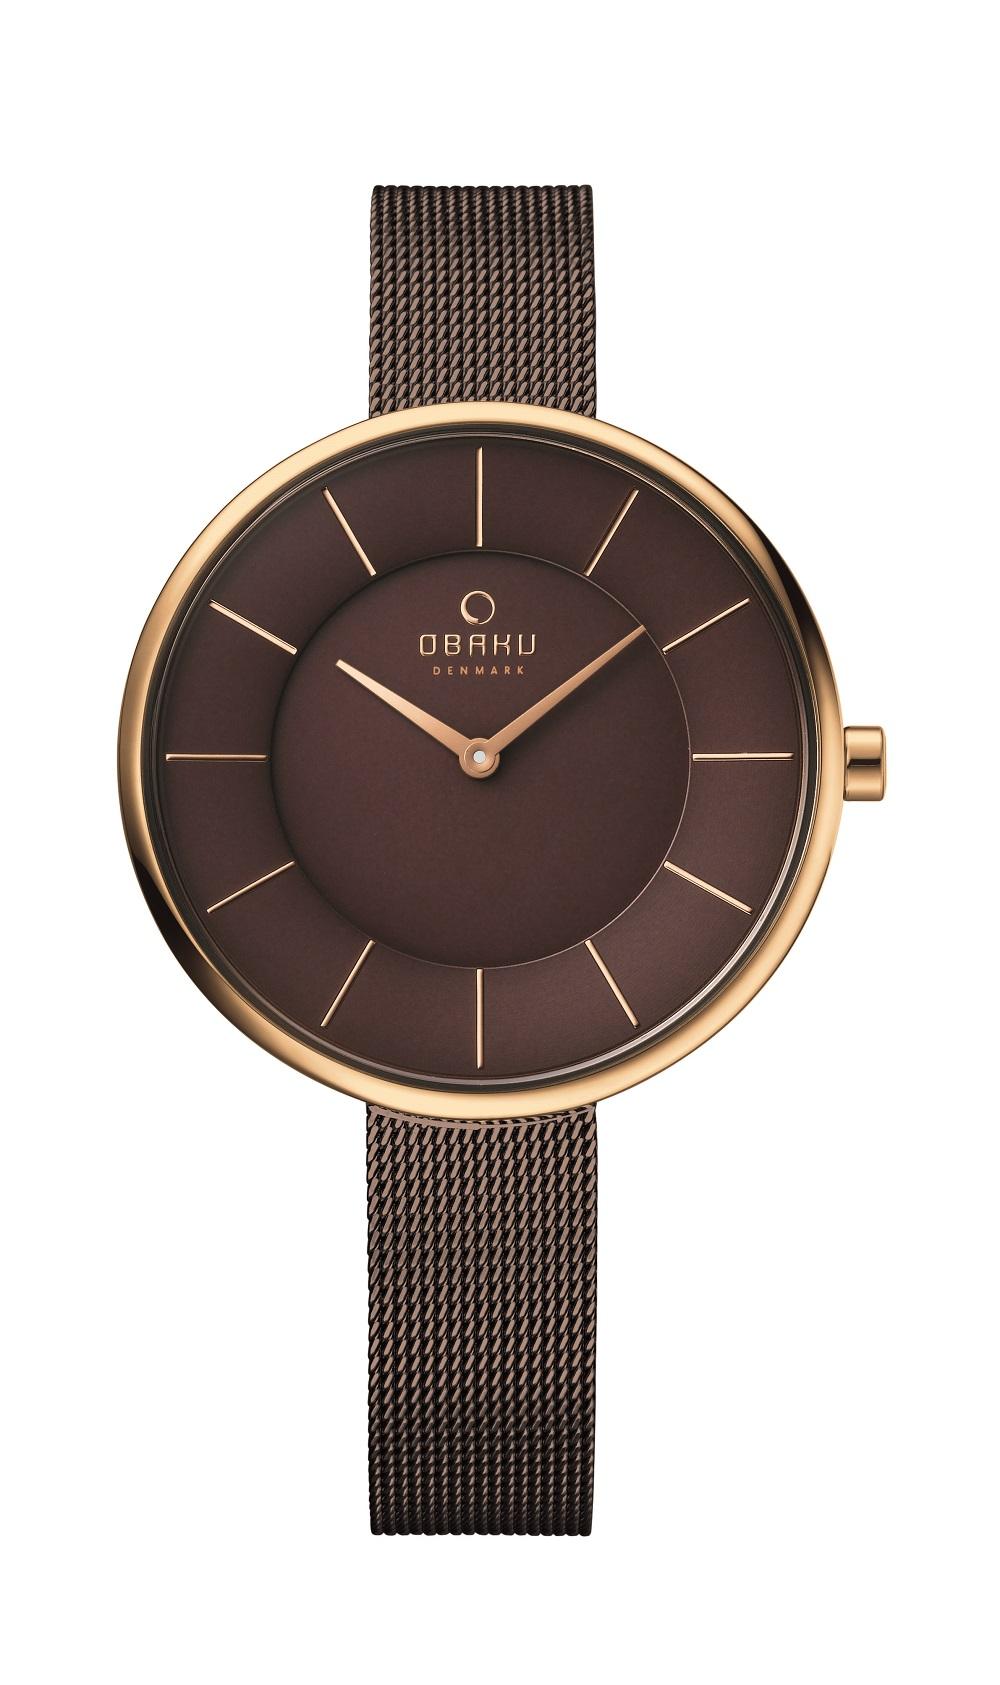 Danish watch brand OBAKU releases new signature watch ...